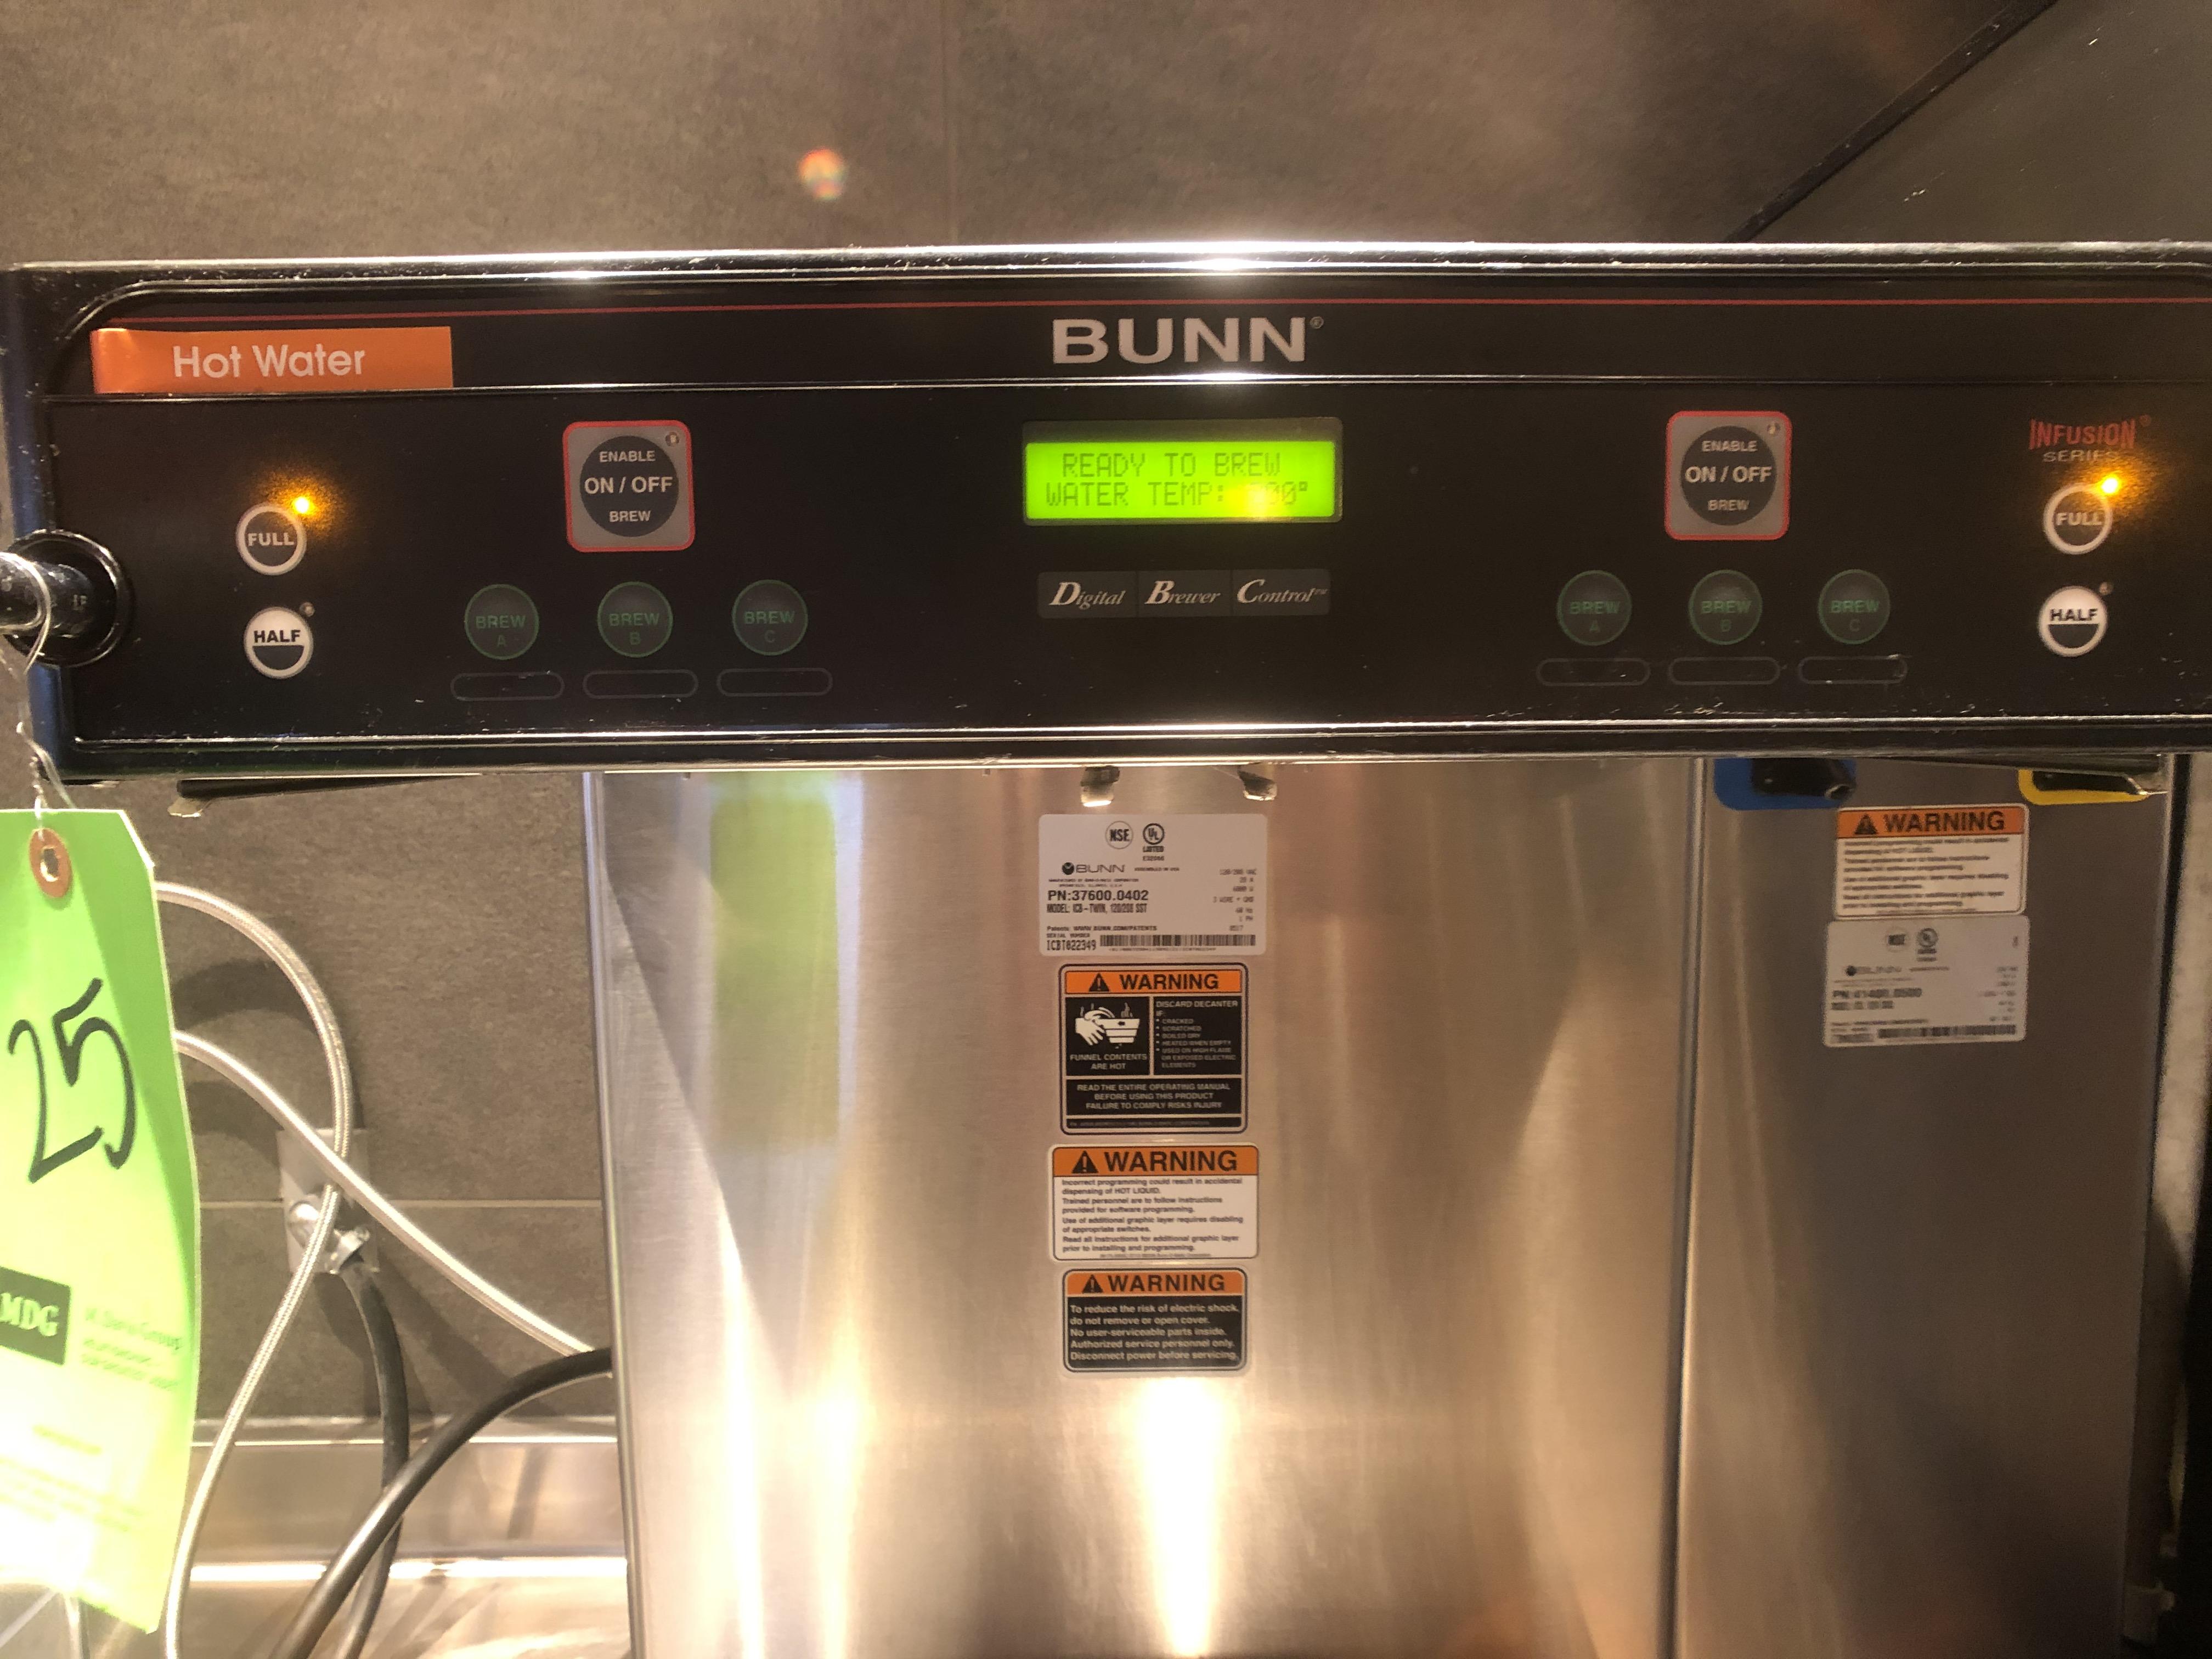 Bunn (2) Pot Coffee Maker, Model ICB-Twin, 120/208 SST, S/N ICBT022349 - Image 5 of 5